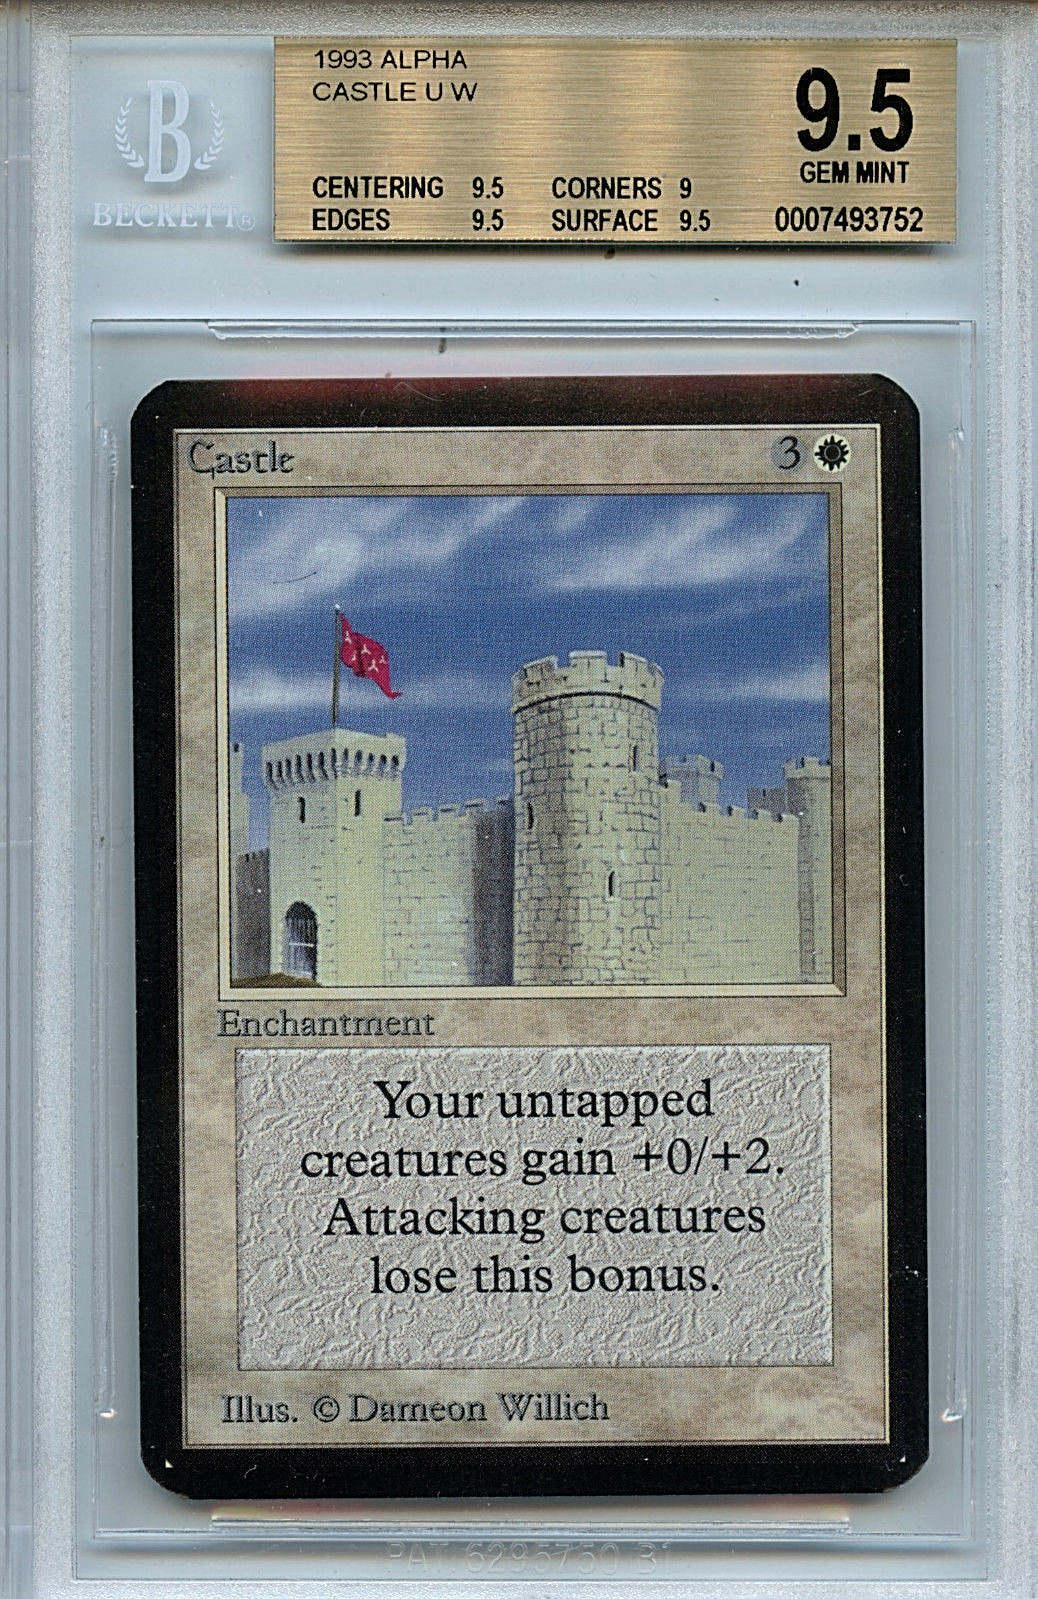 MTG Alpha Castle BGS 9.5 Gem Mint Magic Card WOTC 3752 Amricons